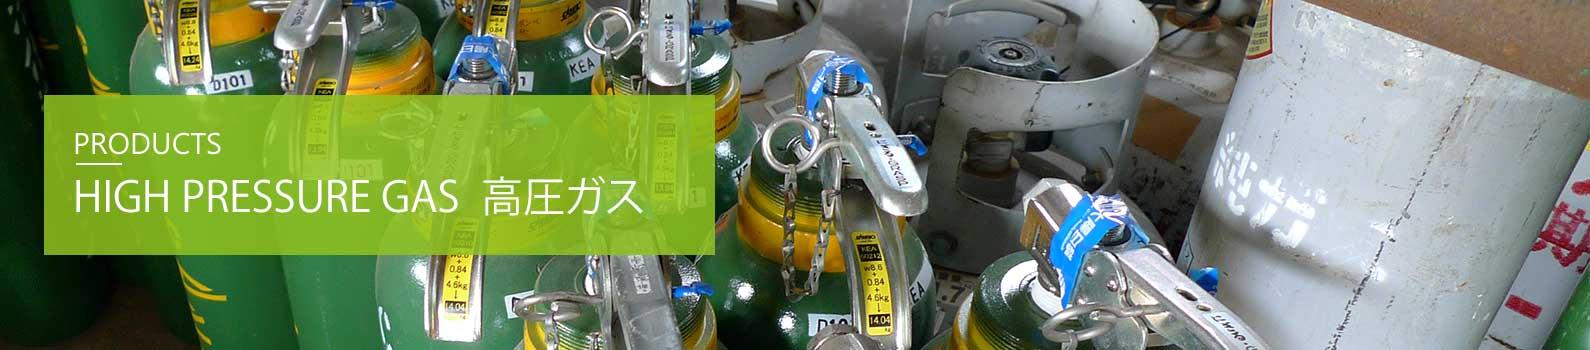 HIGH PRESSURE GAS 高圧ガス